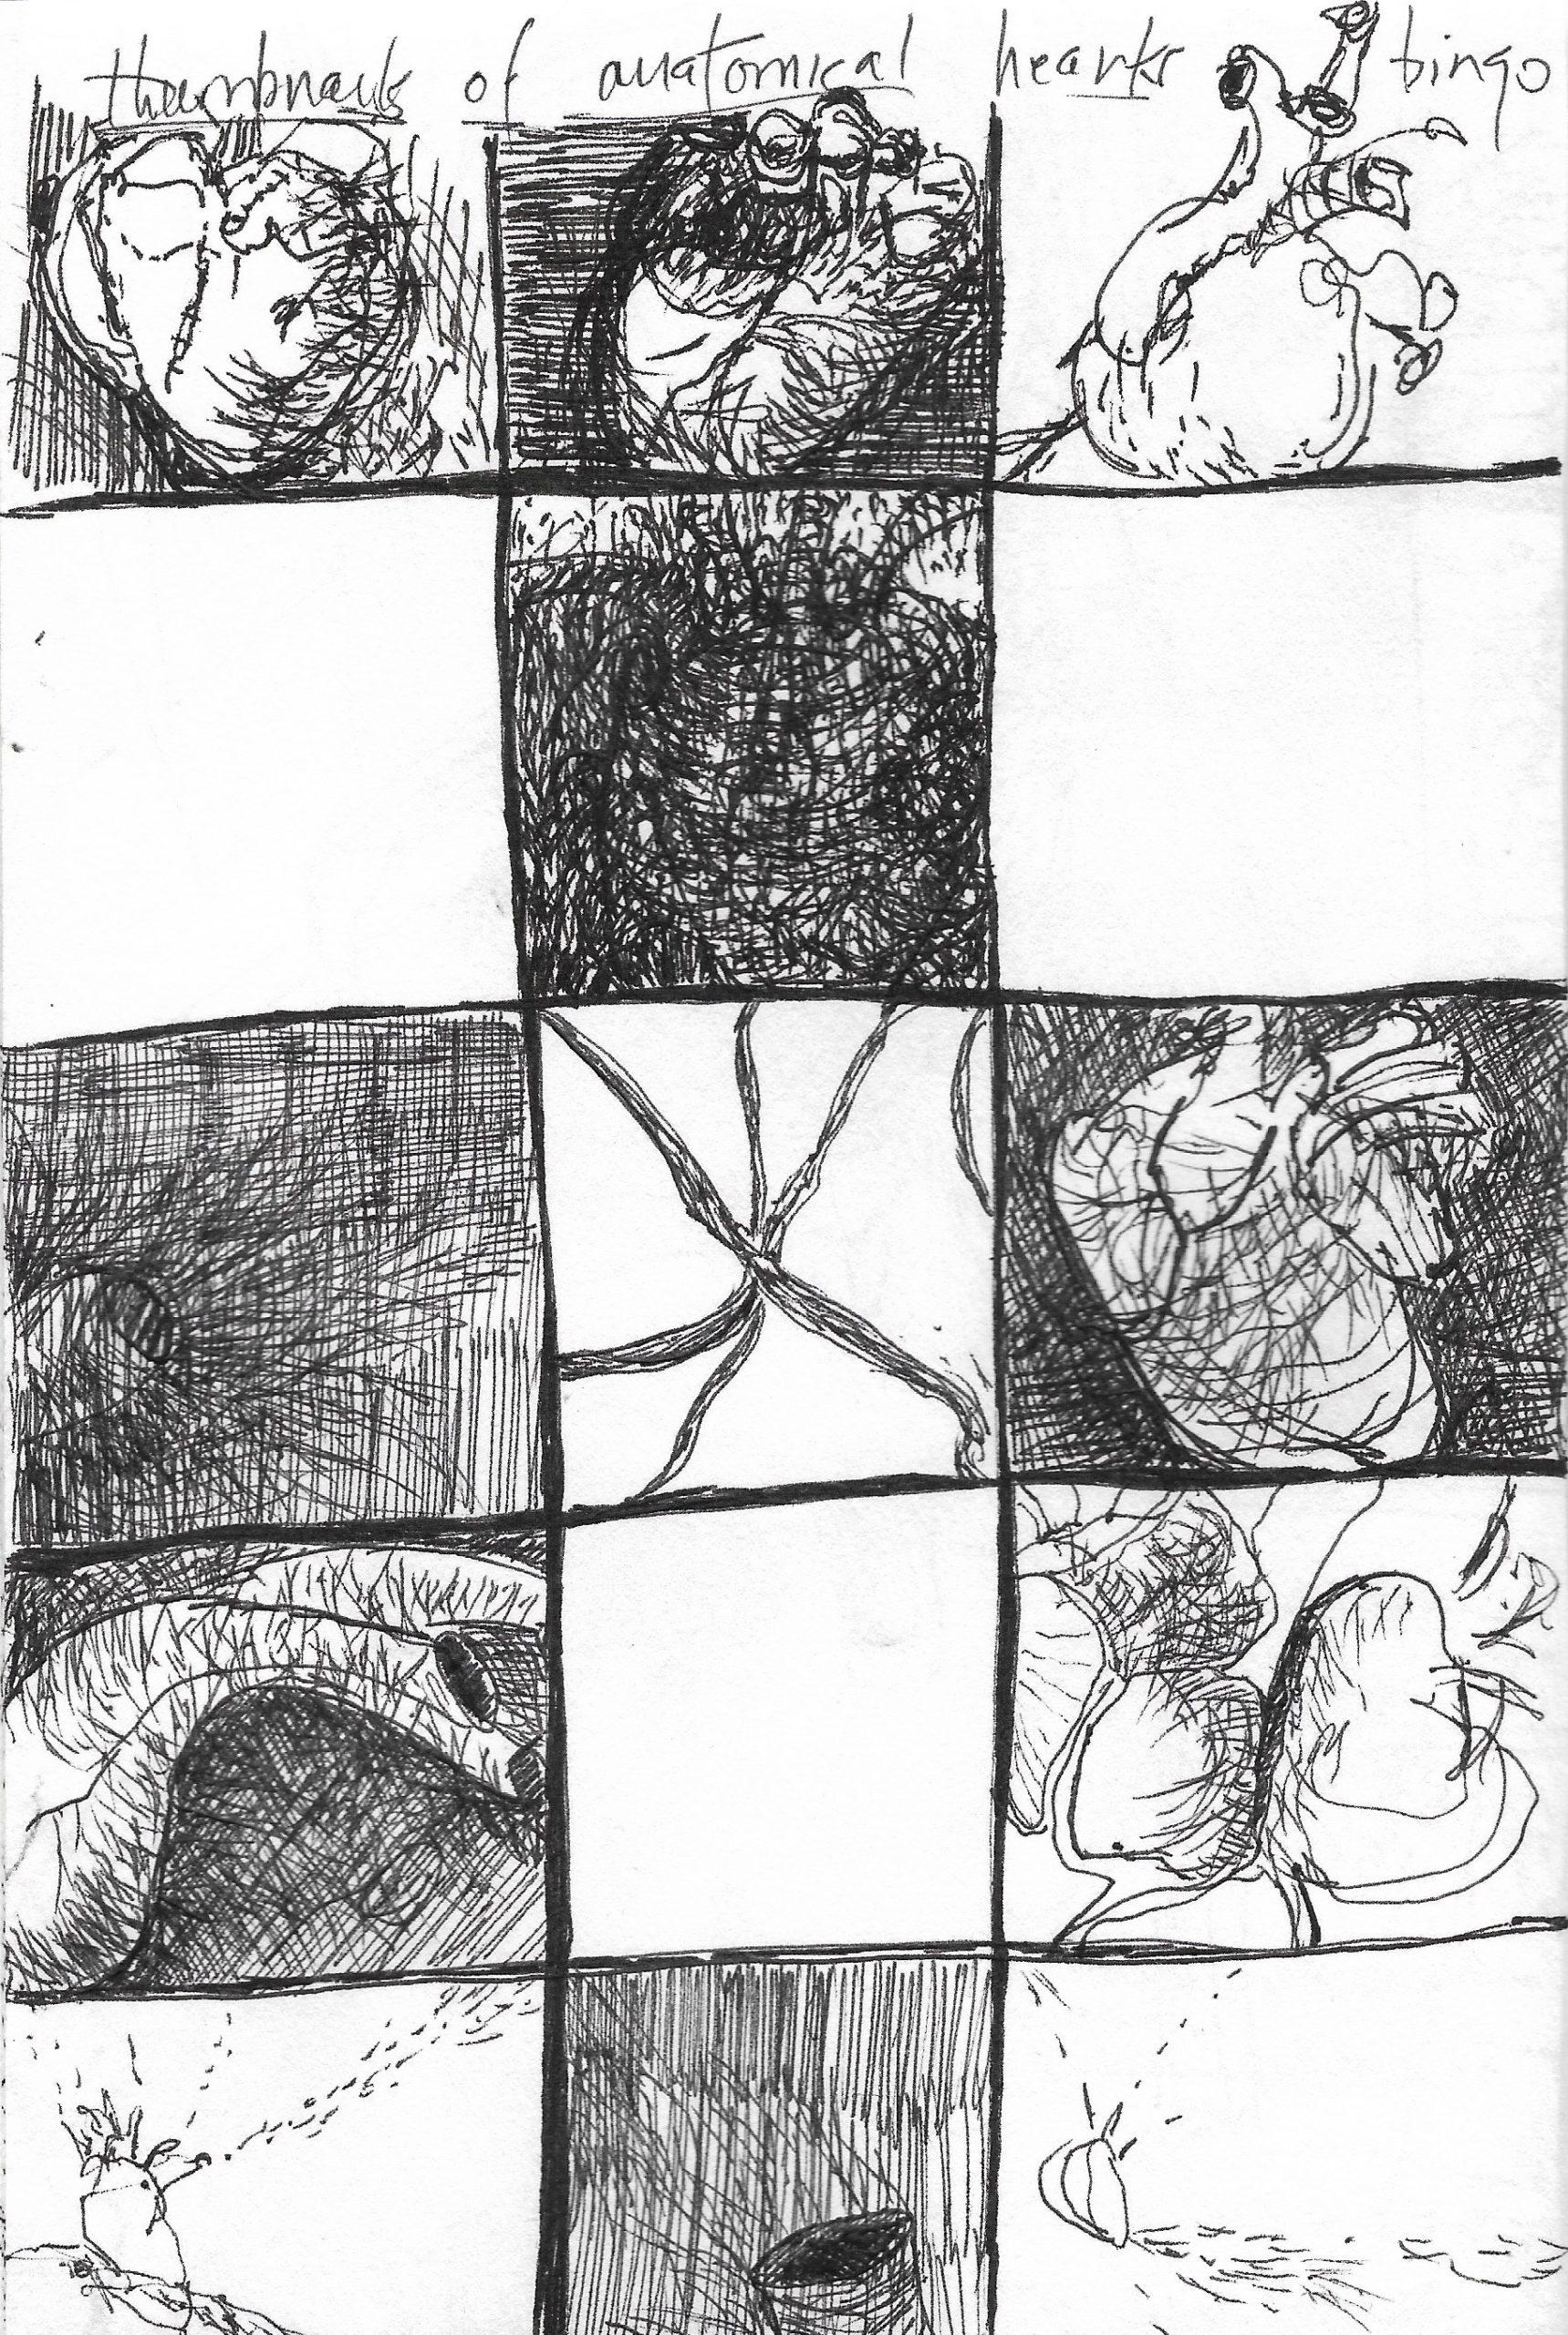 Anatomical Bingo